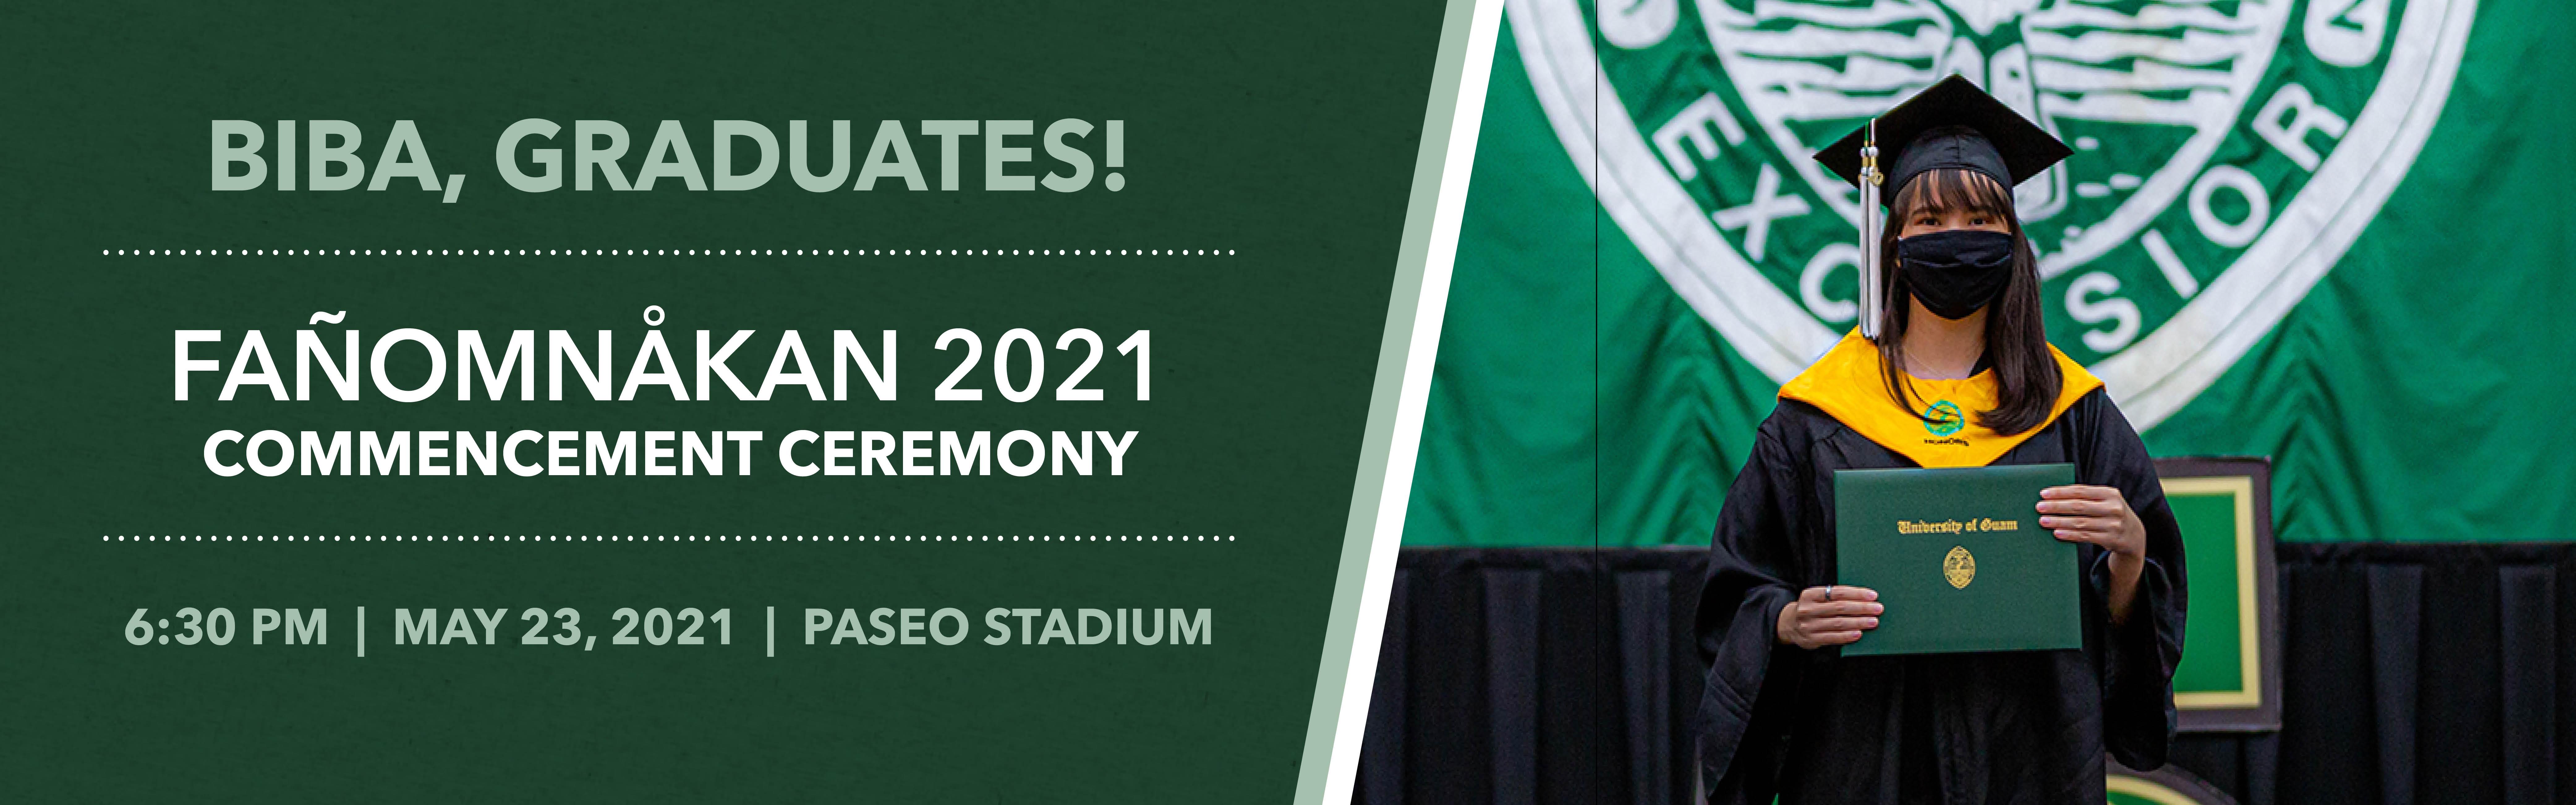 Biba Graduates of Fañomnåkan 2021!